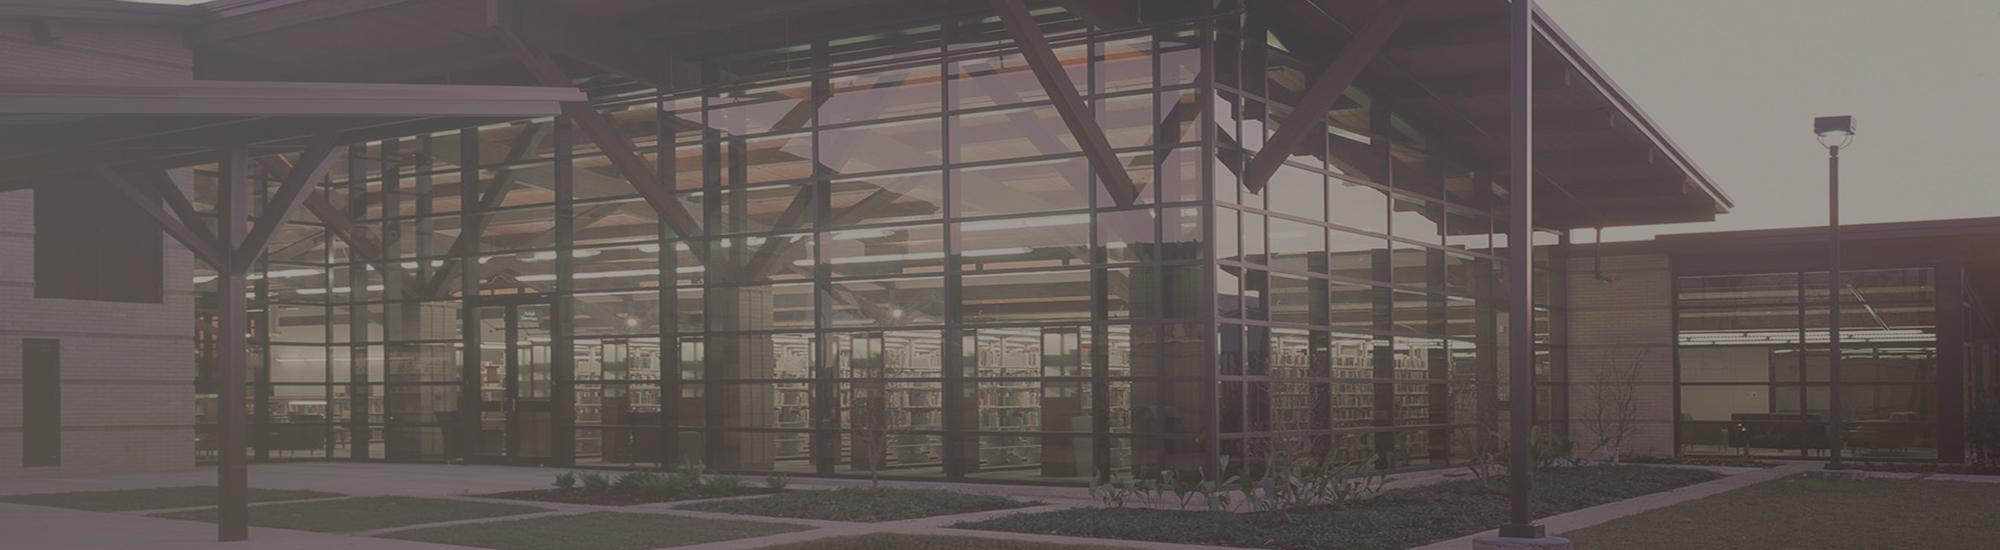 Eden-Park-Library